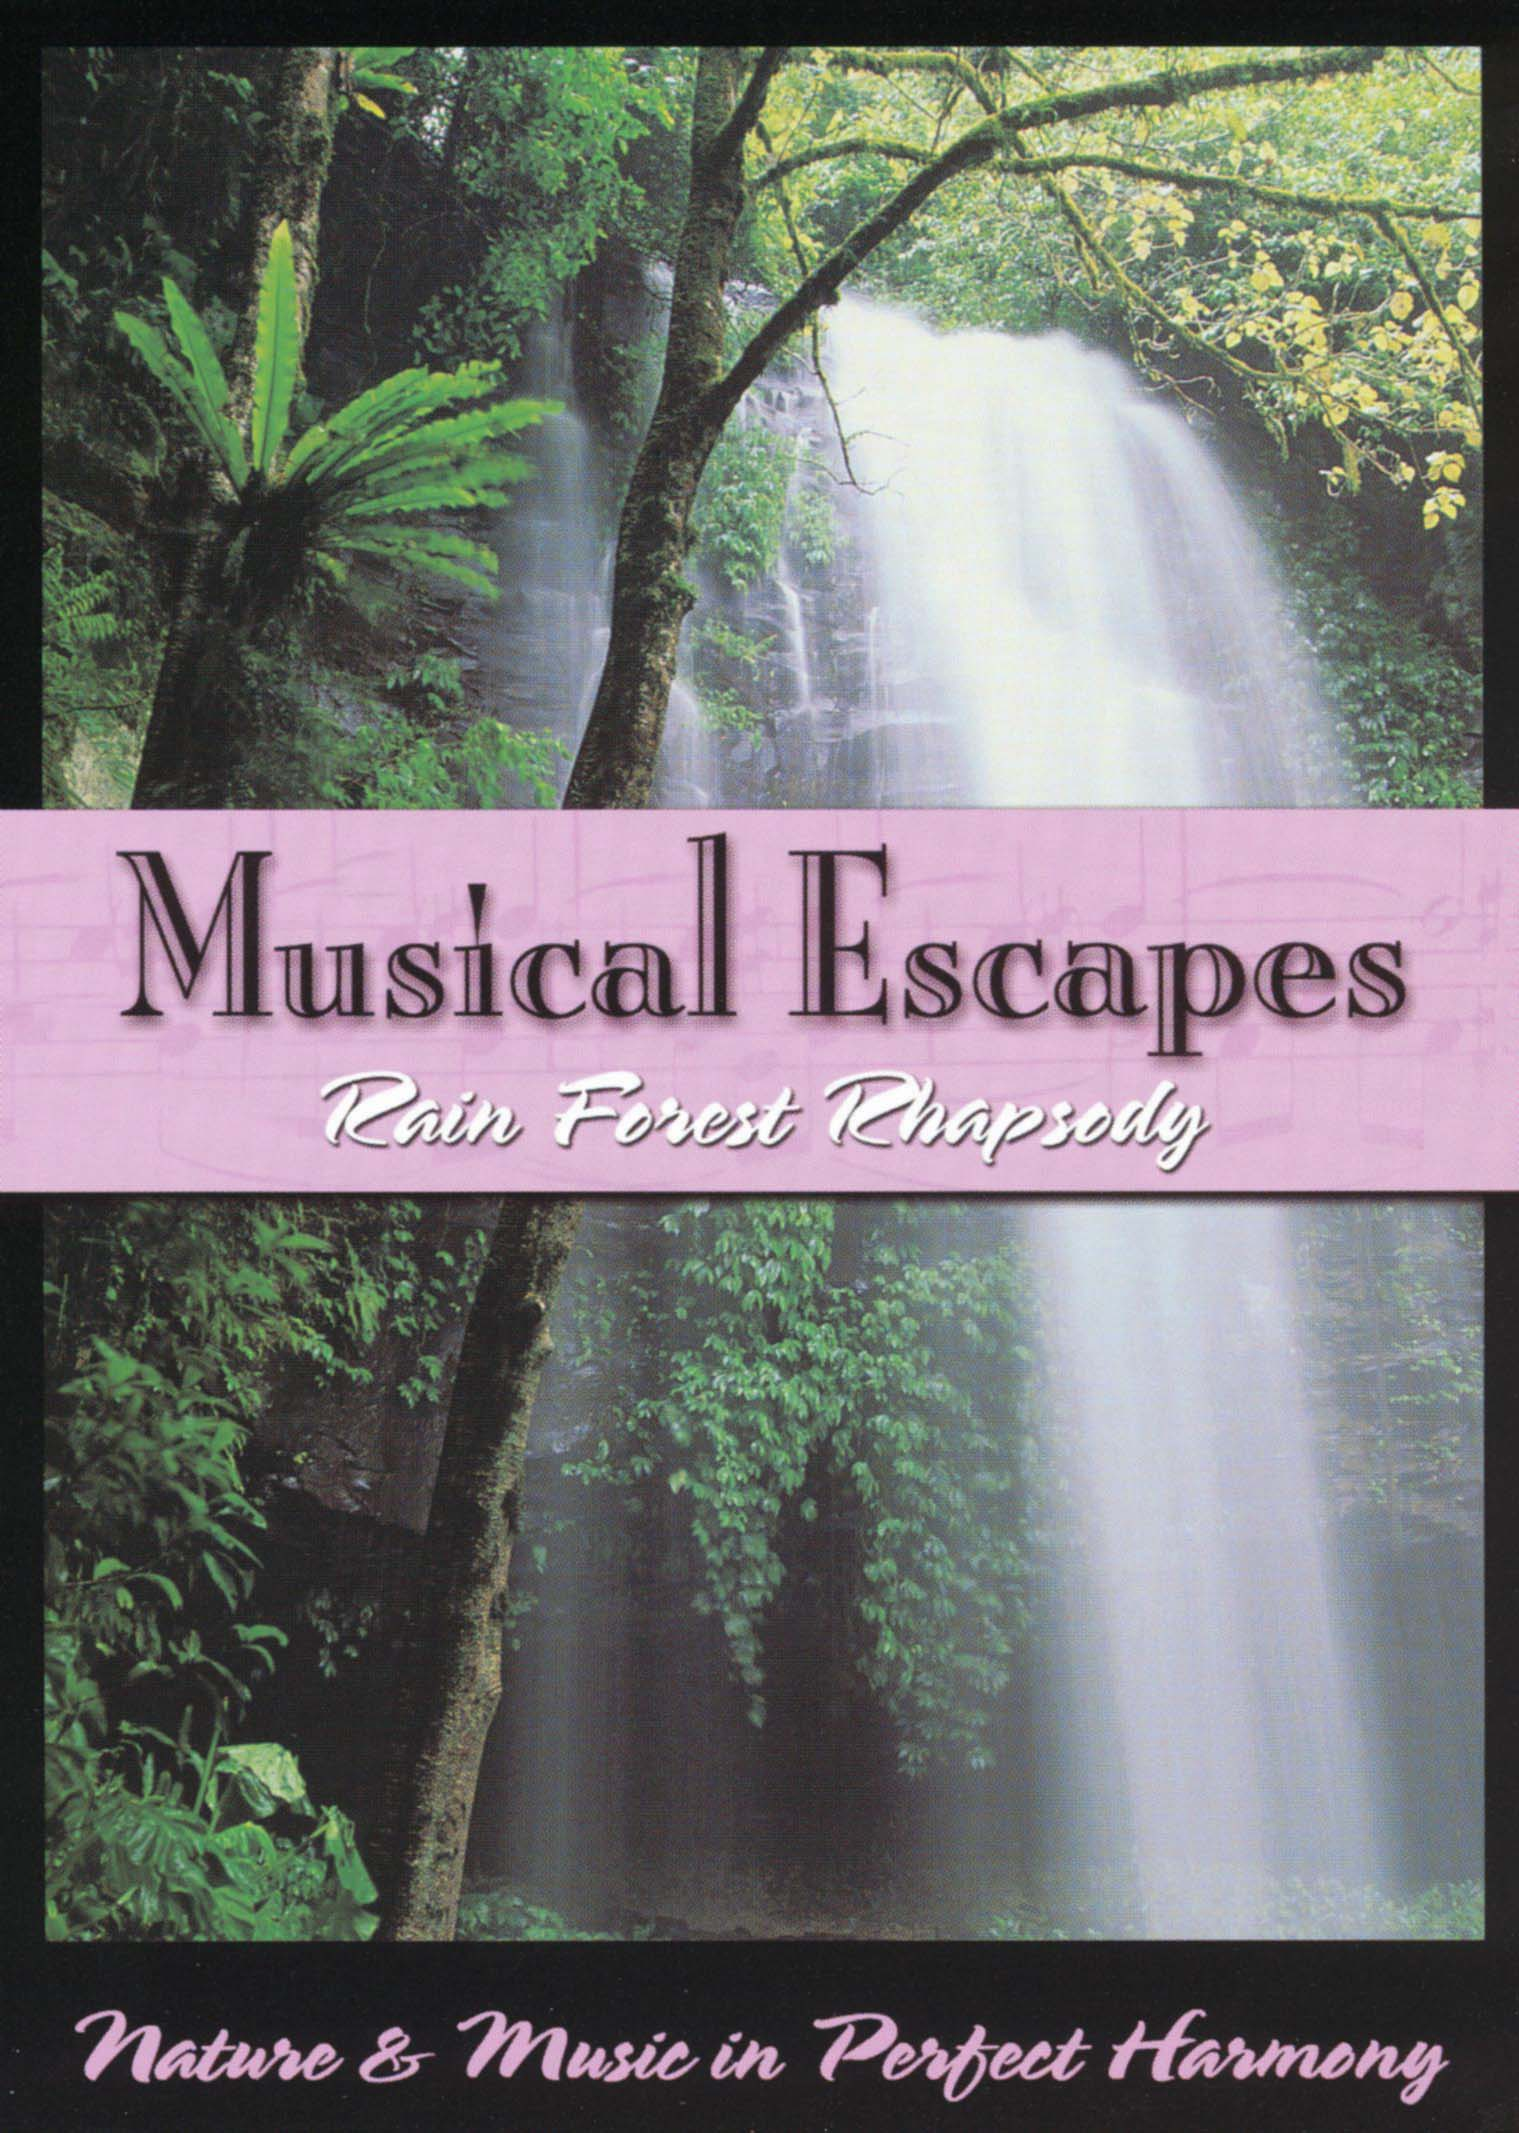 Musical Escapes, Vol. 1: Rain Forest Rhapsody